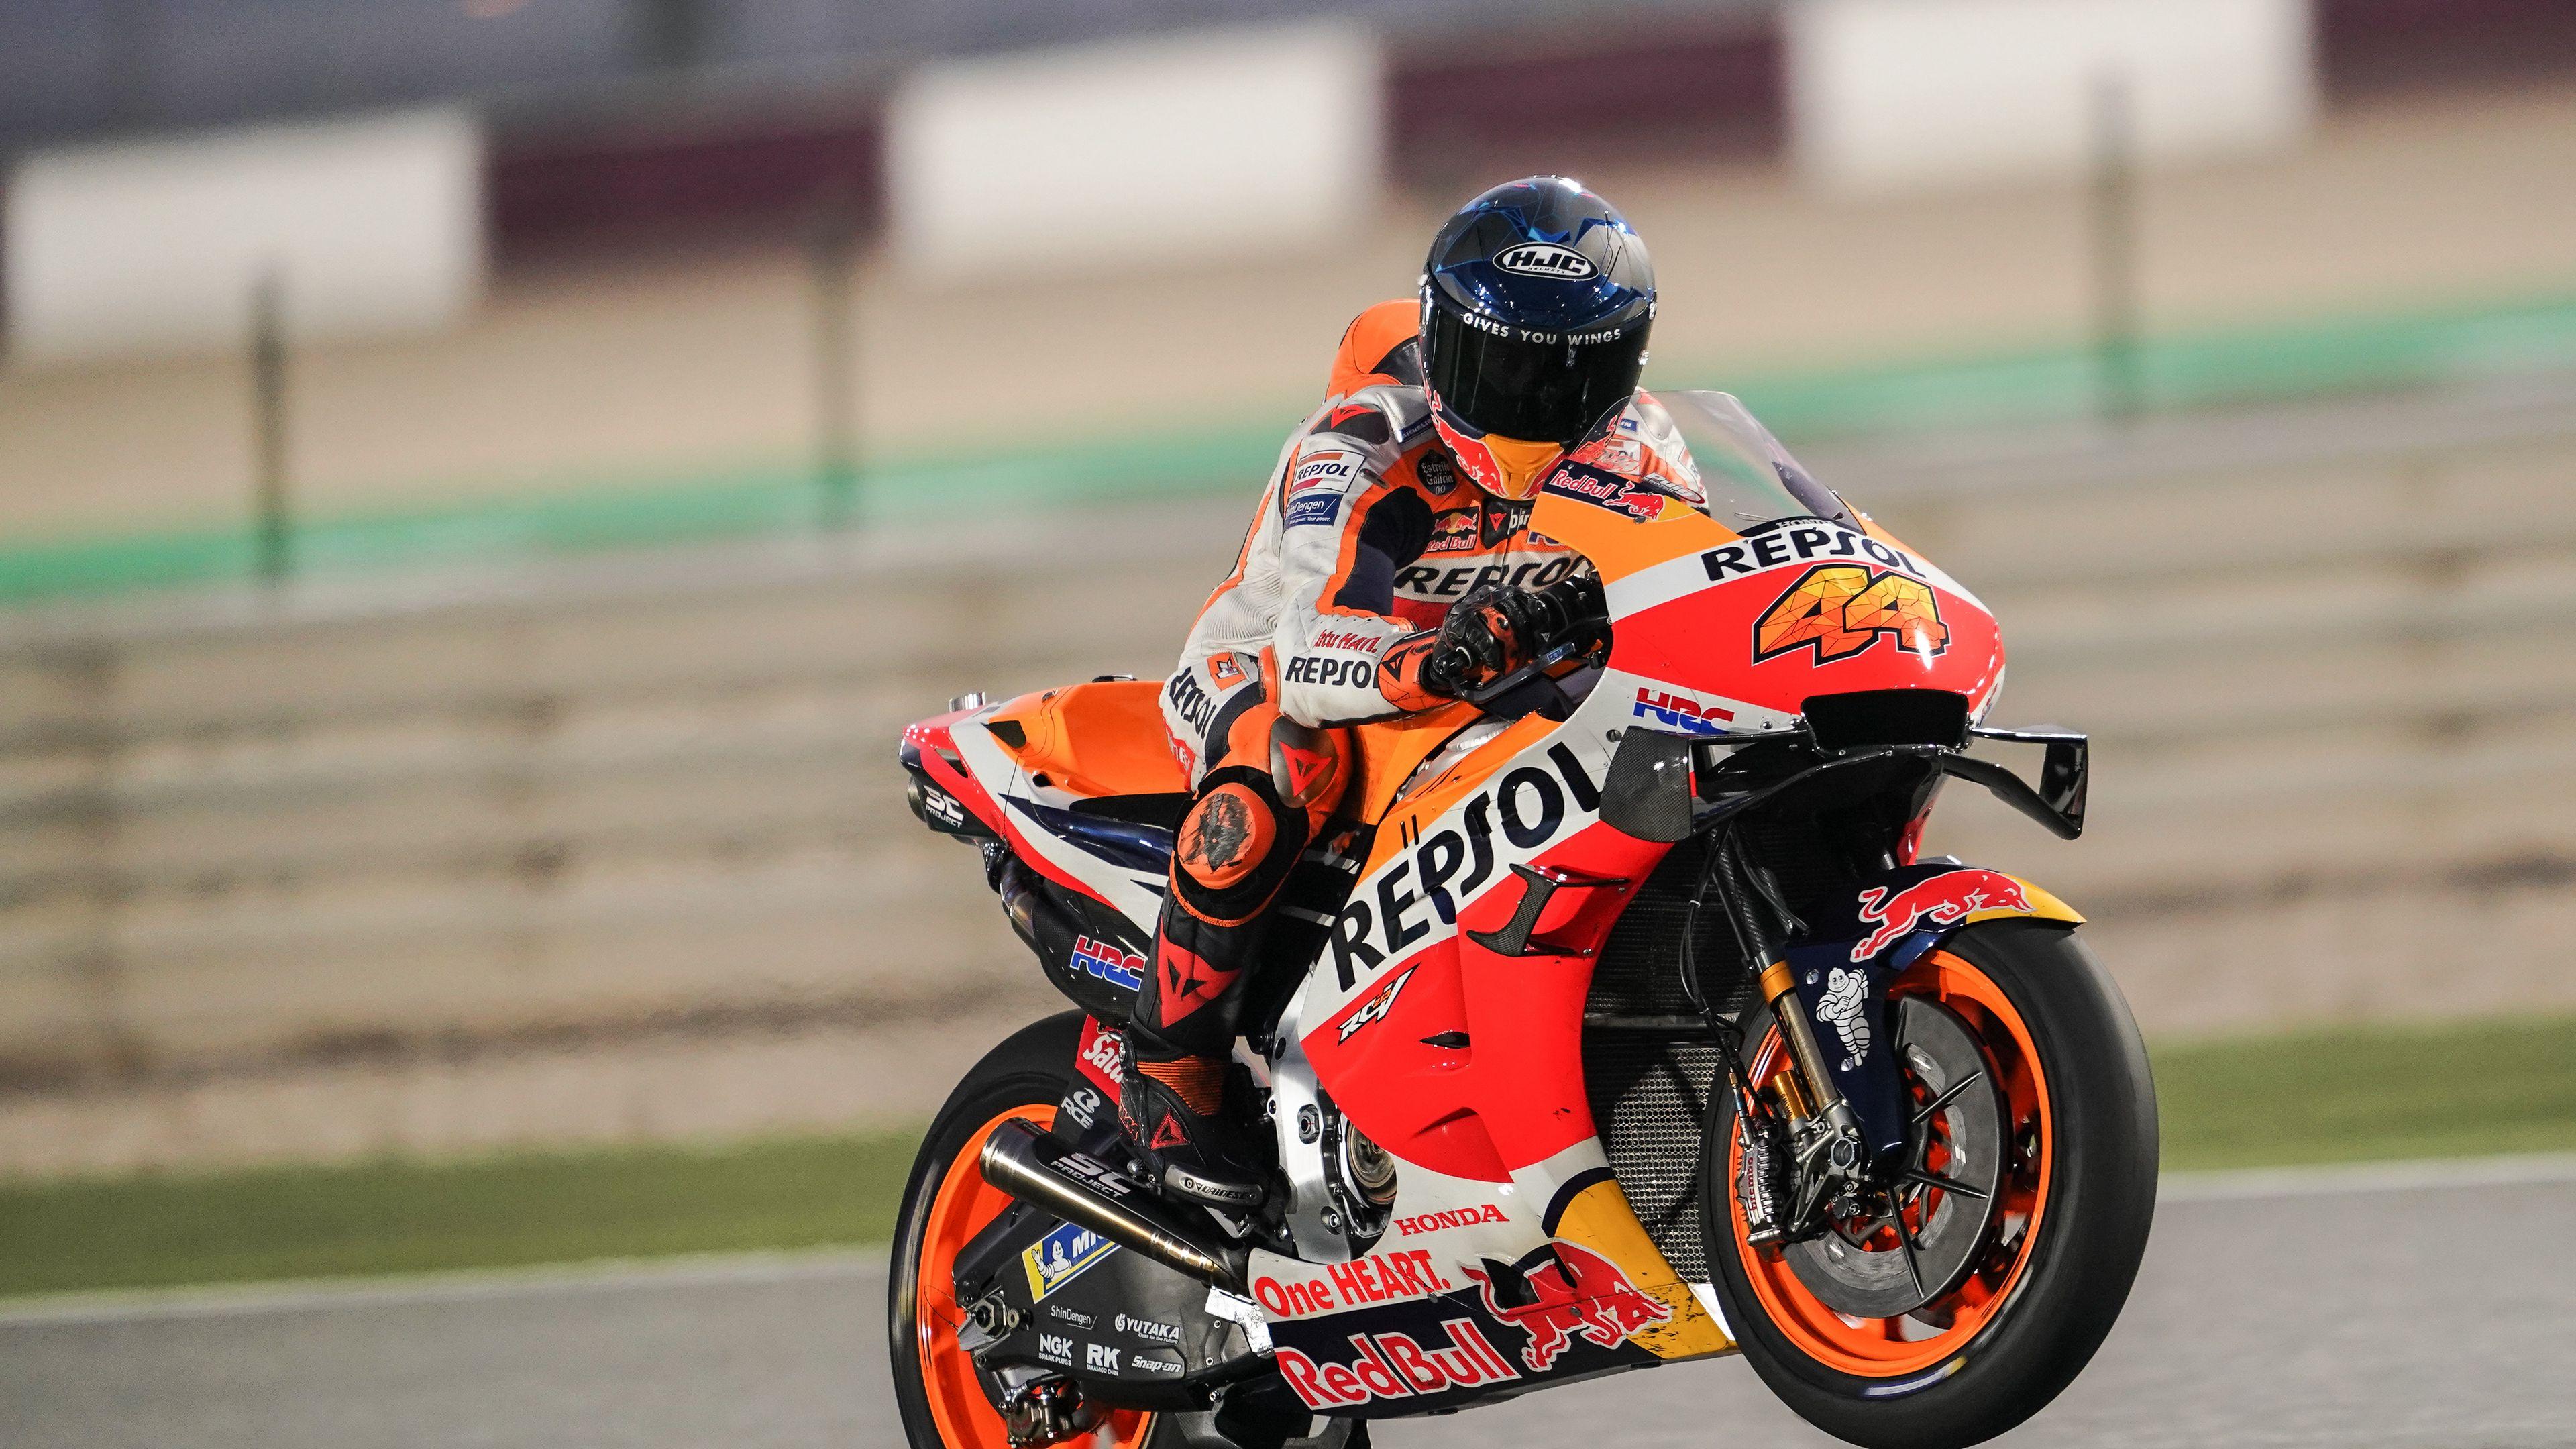 3840x2160 Wallpaper honda, motorcycle, motorcyclist, helmet, speed, track, orange